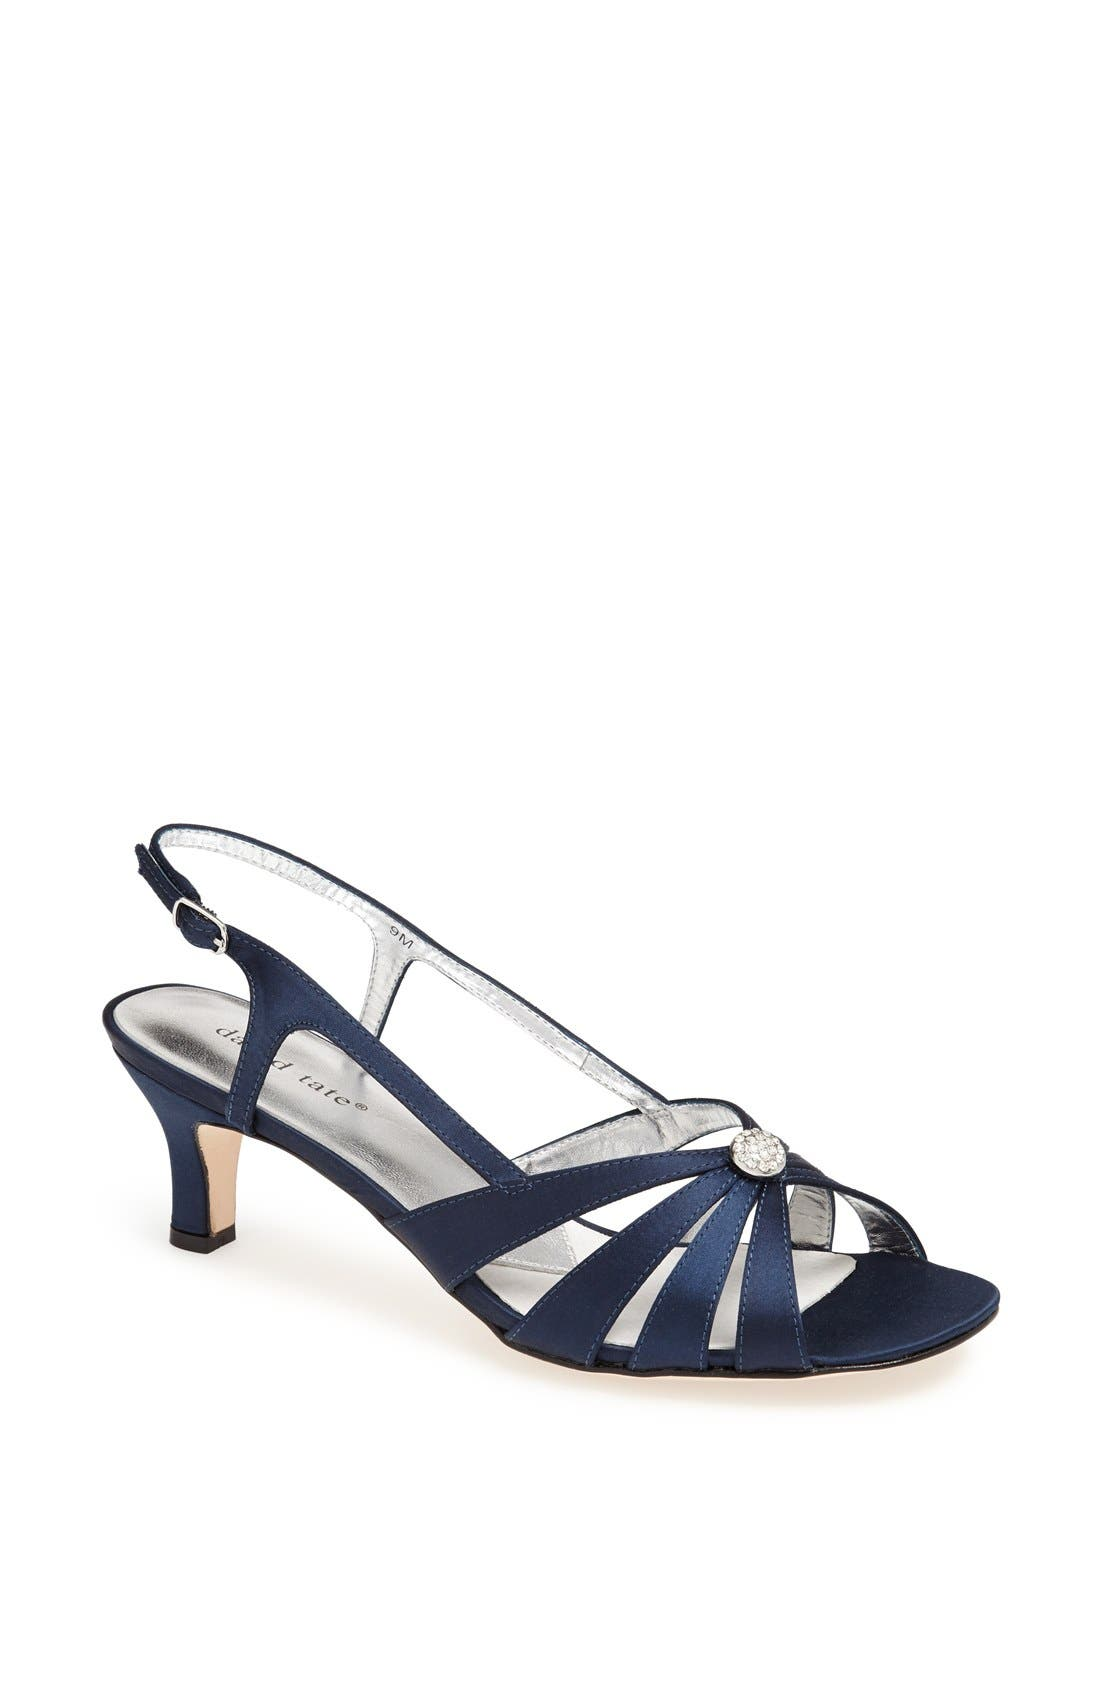 DAVID TATE 'Rosette' Sandal, Main, color, NAVY